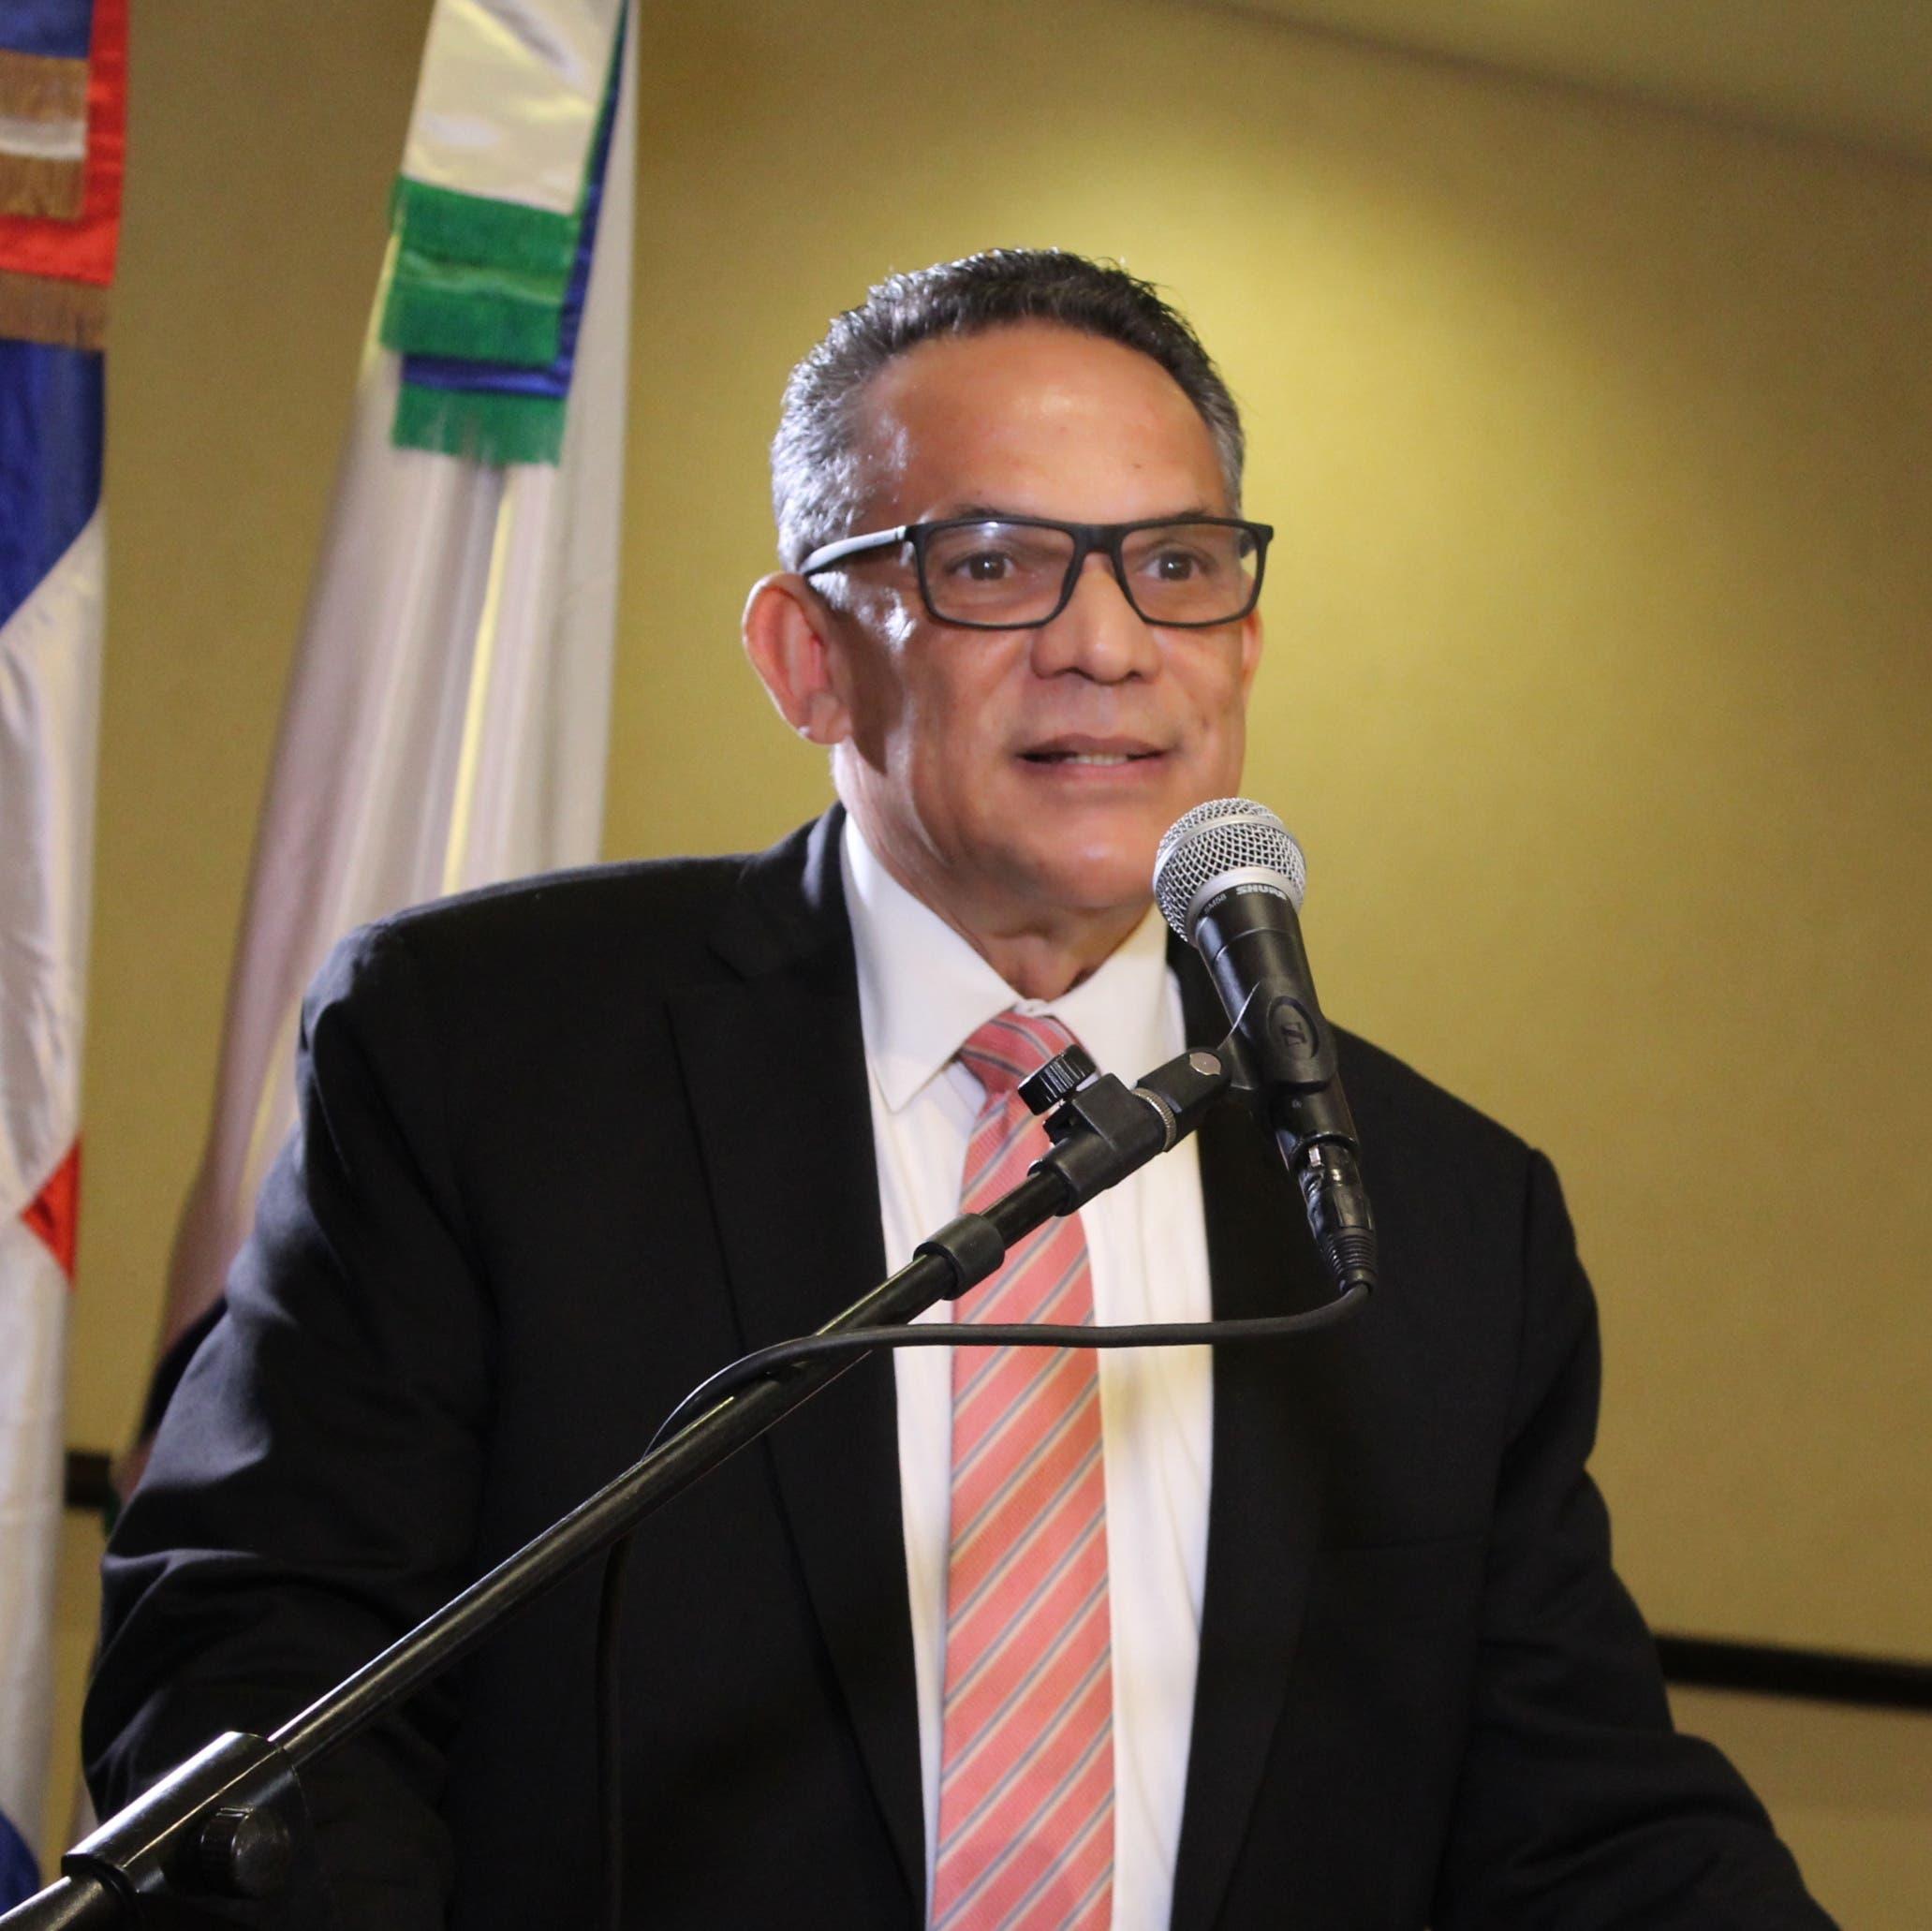 Ventura Camejo felicita a Danilo Medina por decisión de aumentar salarios a sector público